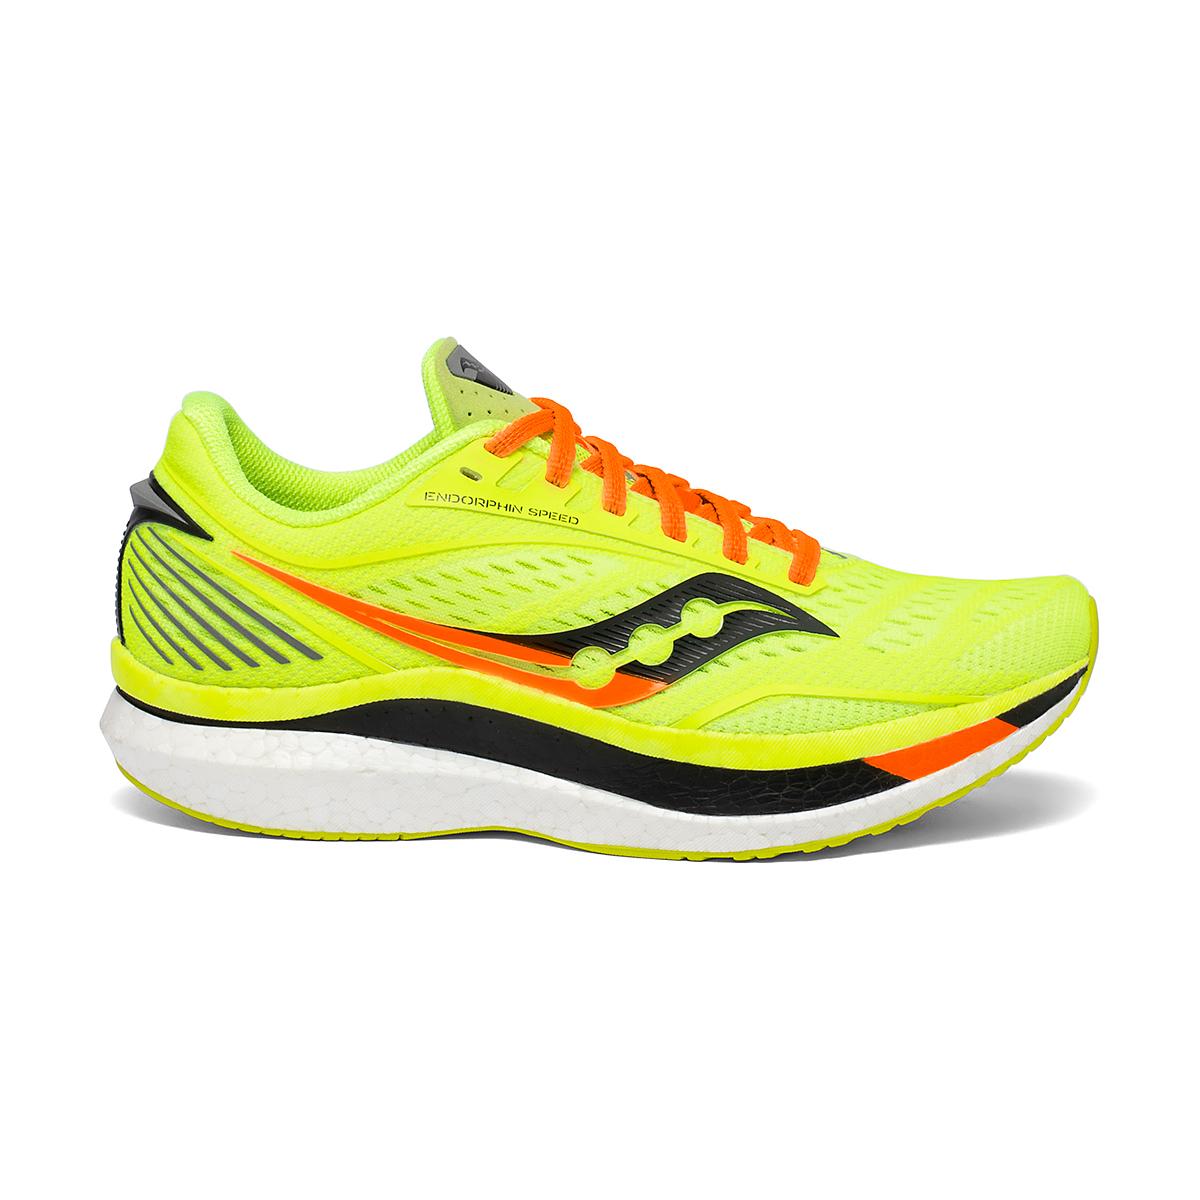 Men's Saucony VIZIPRO Speed Endorphin Speed Running Shoe - Color: Citron - Size: 7 - Width: Regular, Citron, large, image 1